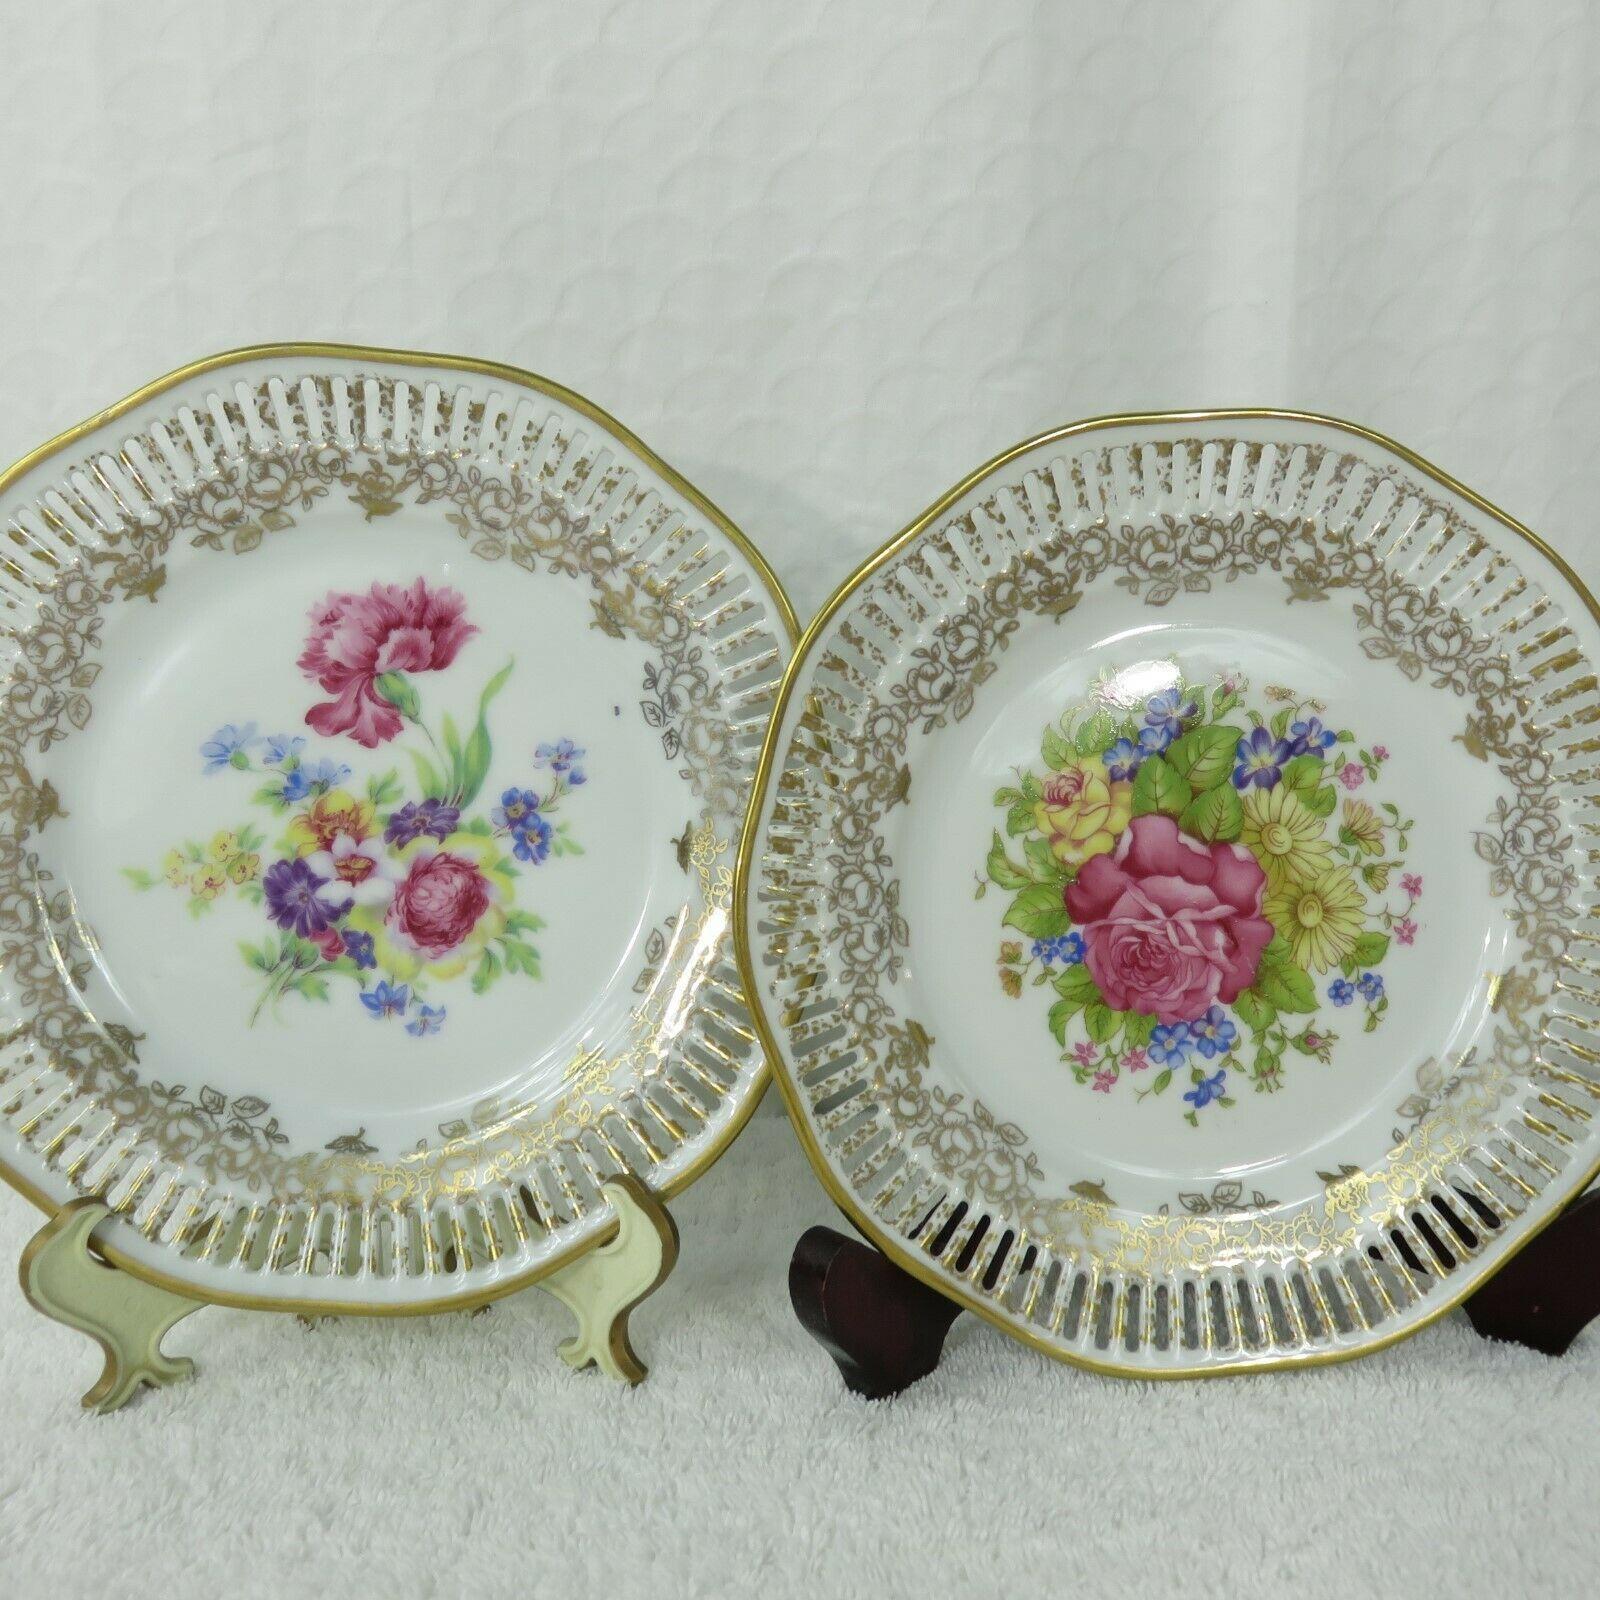 2 Vintage Winterling Bavaria China Germany Salad Plates Floral Gold Pierced Edge - $89.05